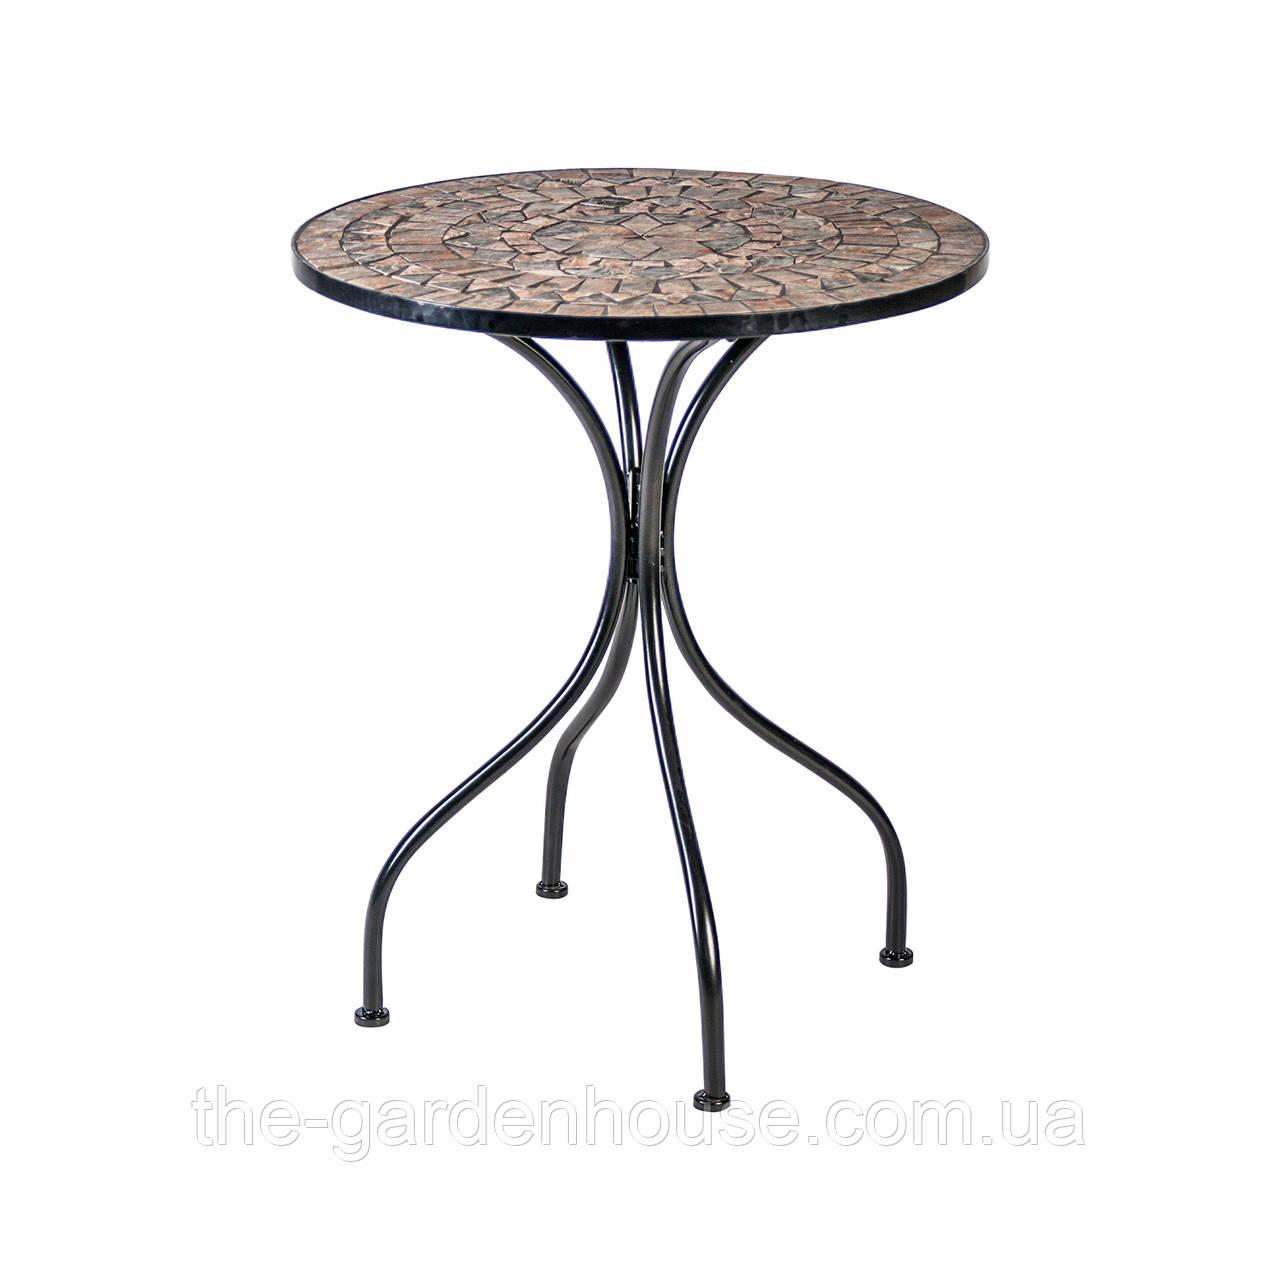 Круглый стол Mosaic Ø 60 см